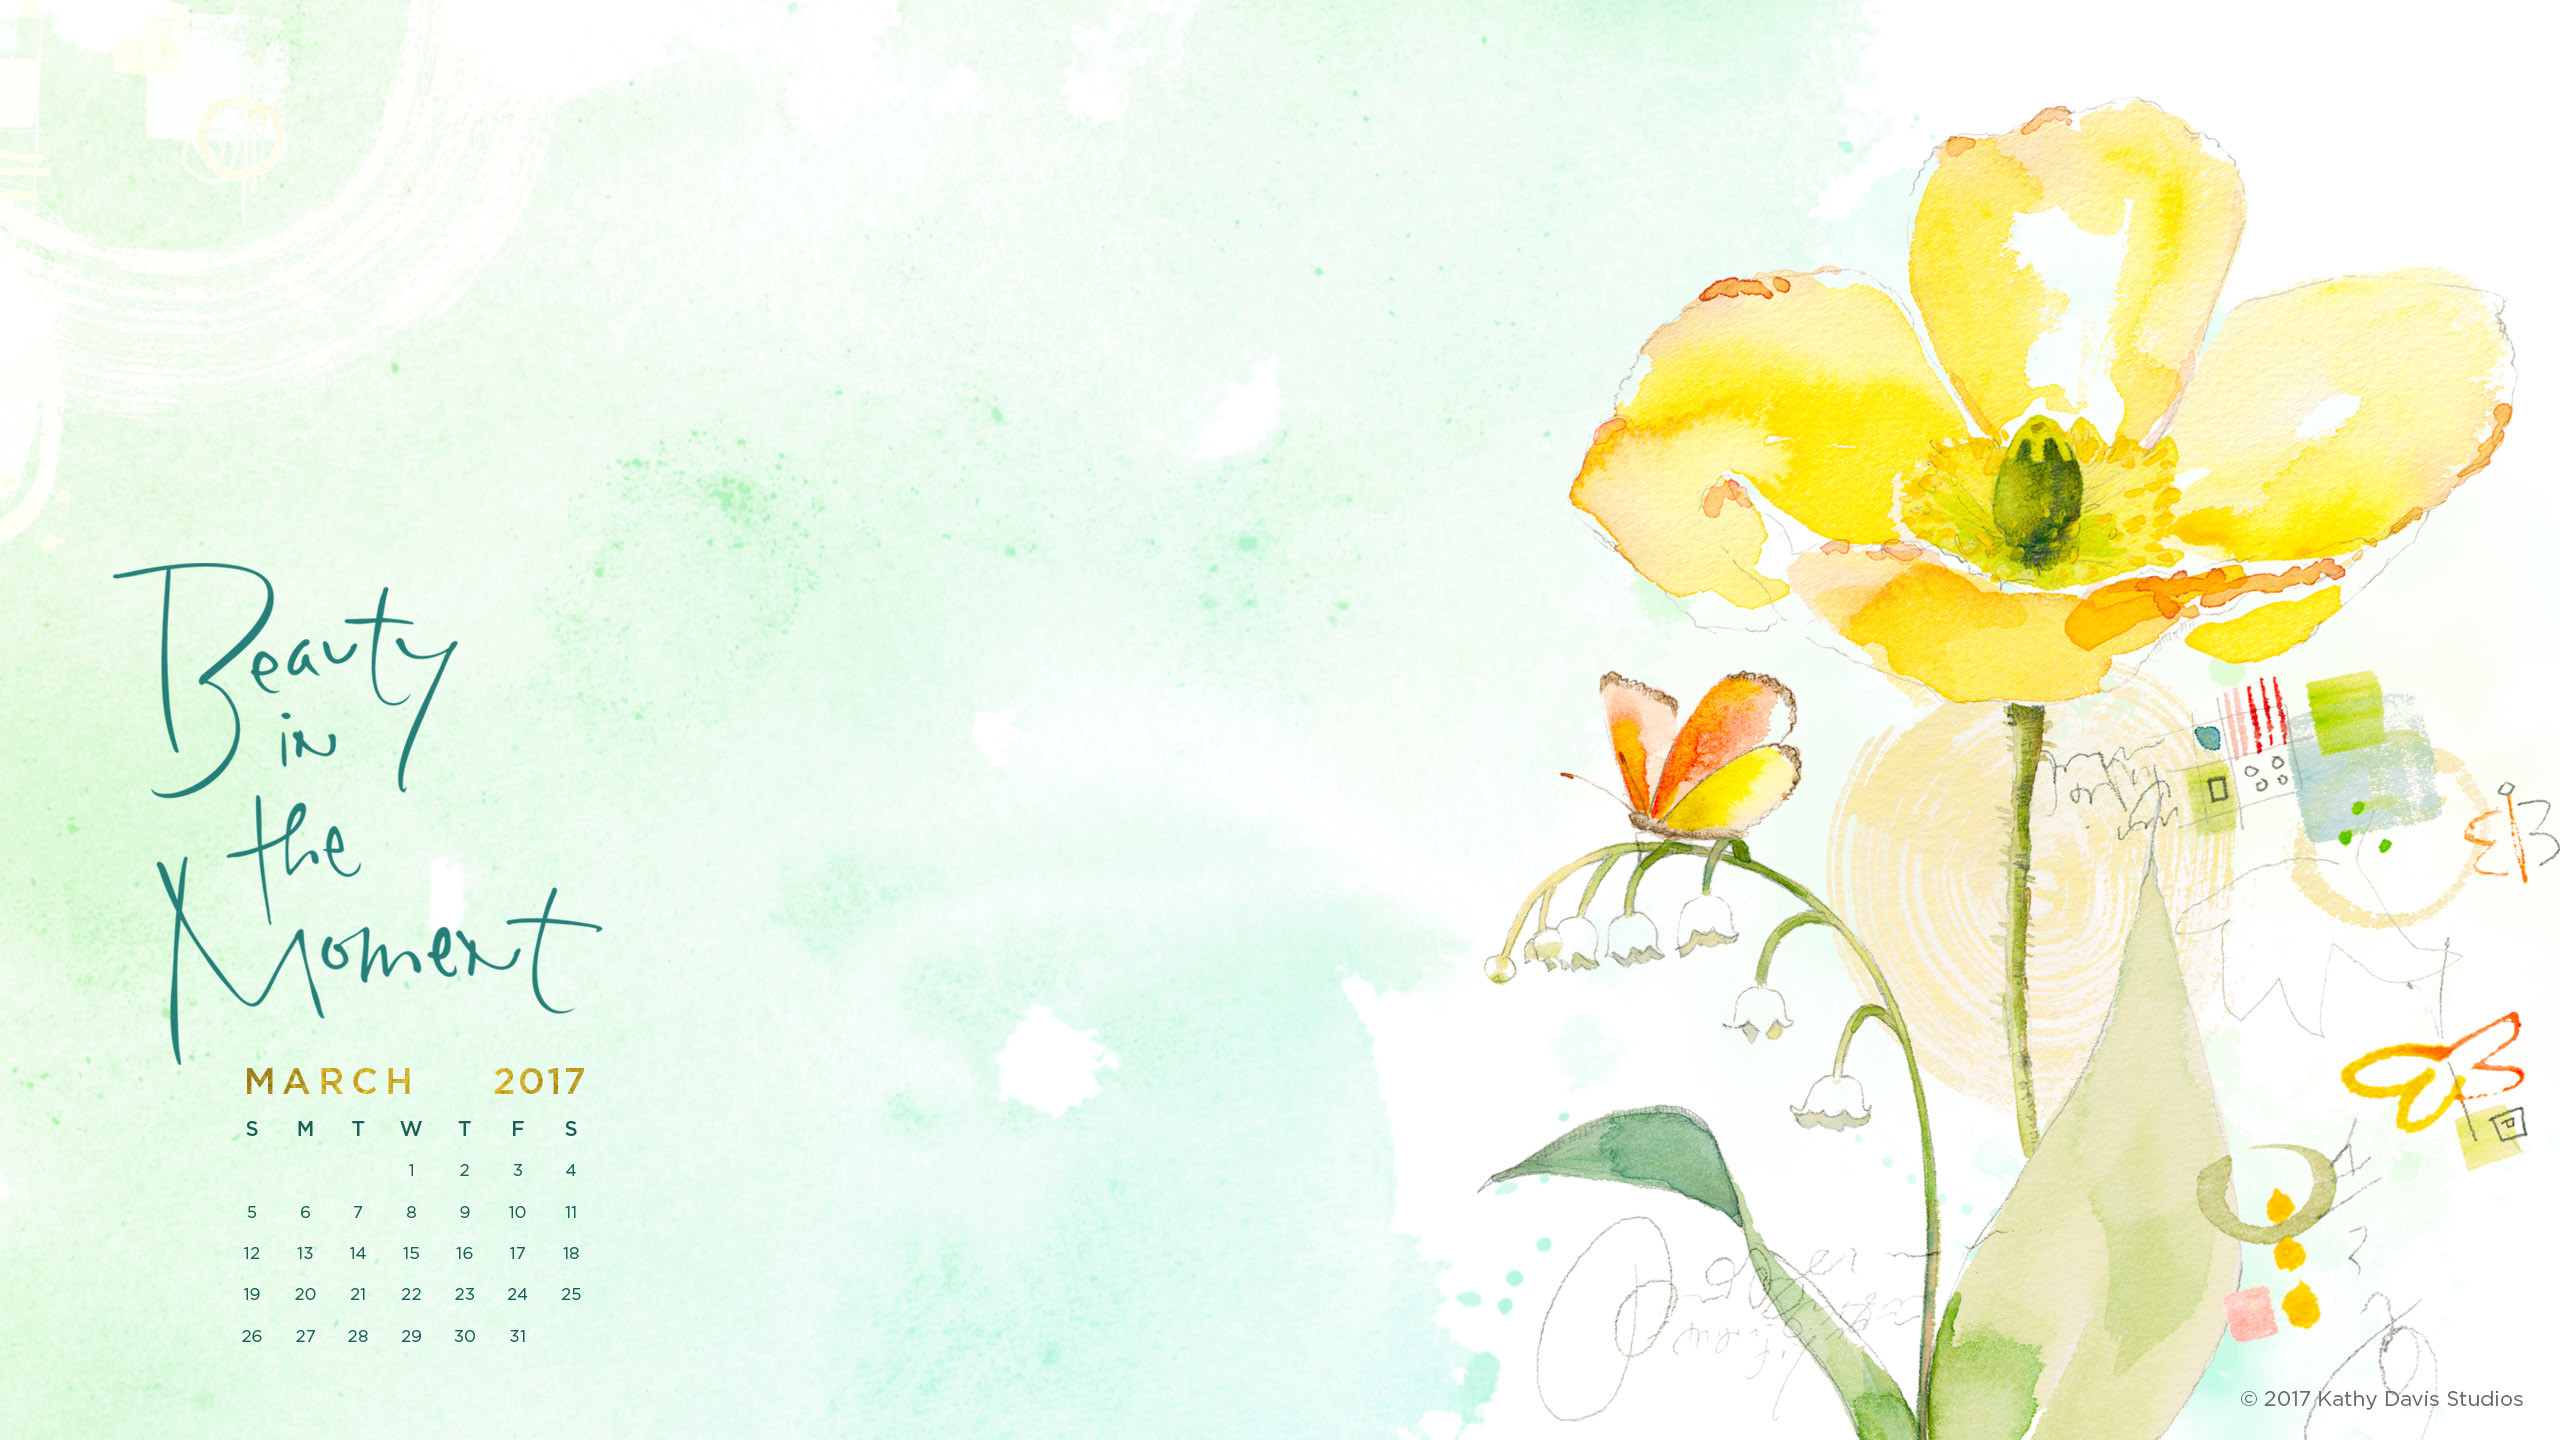 March desktop wallpapers 66 images - March desktop wallpaper ...